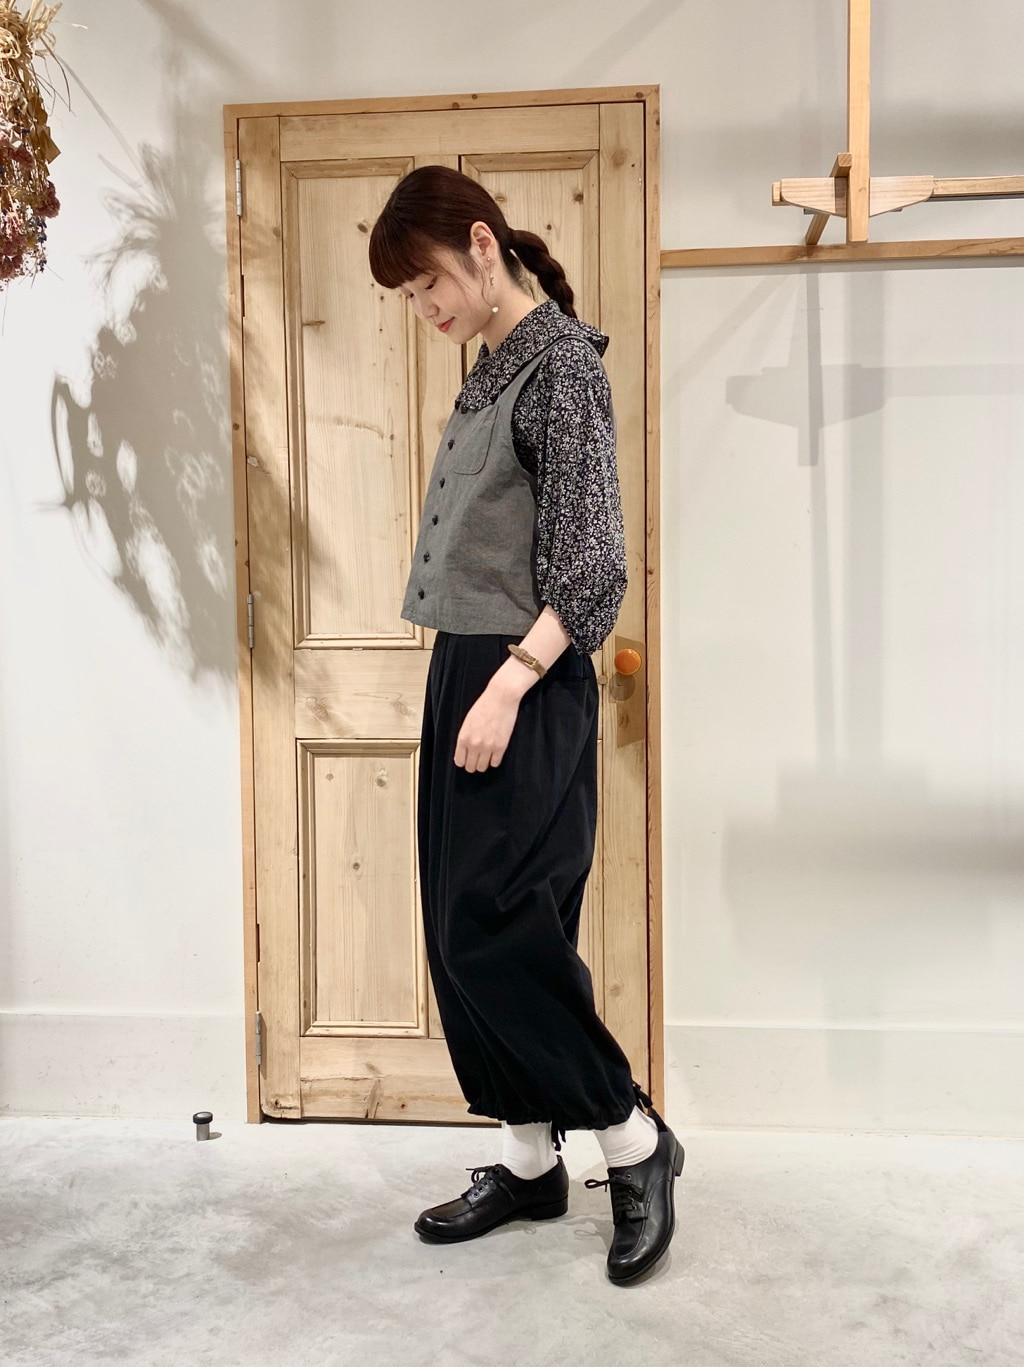 Malle chambre de charme 調布パルコ 身長:167cm 2020.08.27